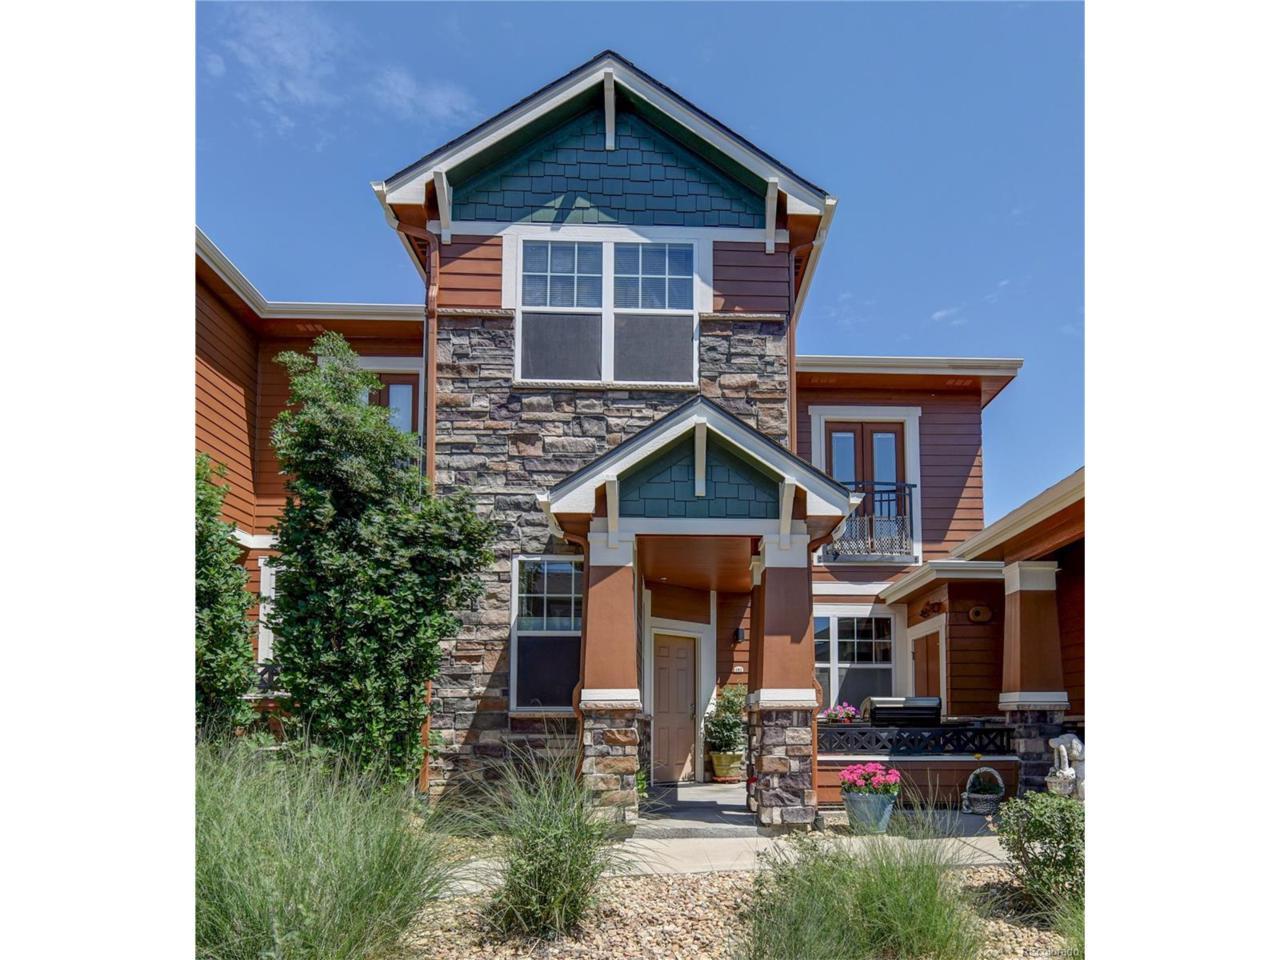 7090 Simms Street #102, Arvada, CO 80004 (MLS #3954021) :: 8z Real Estate